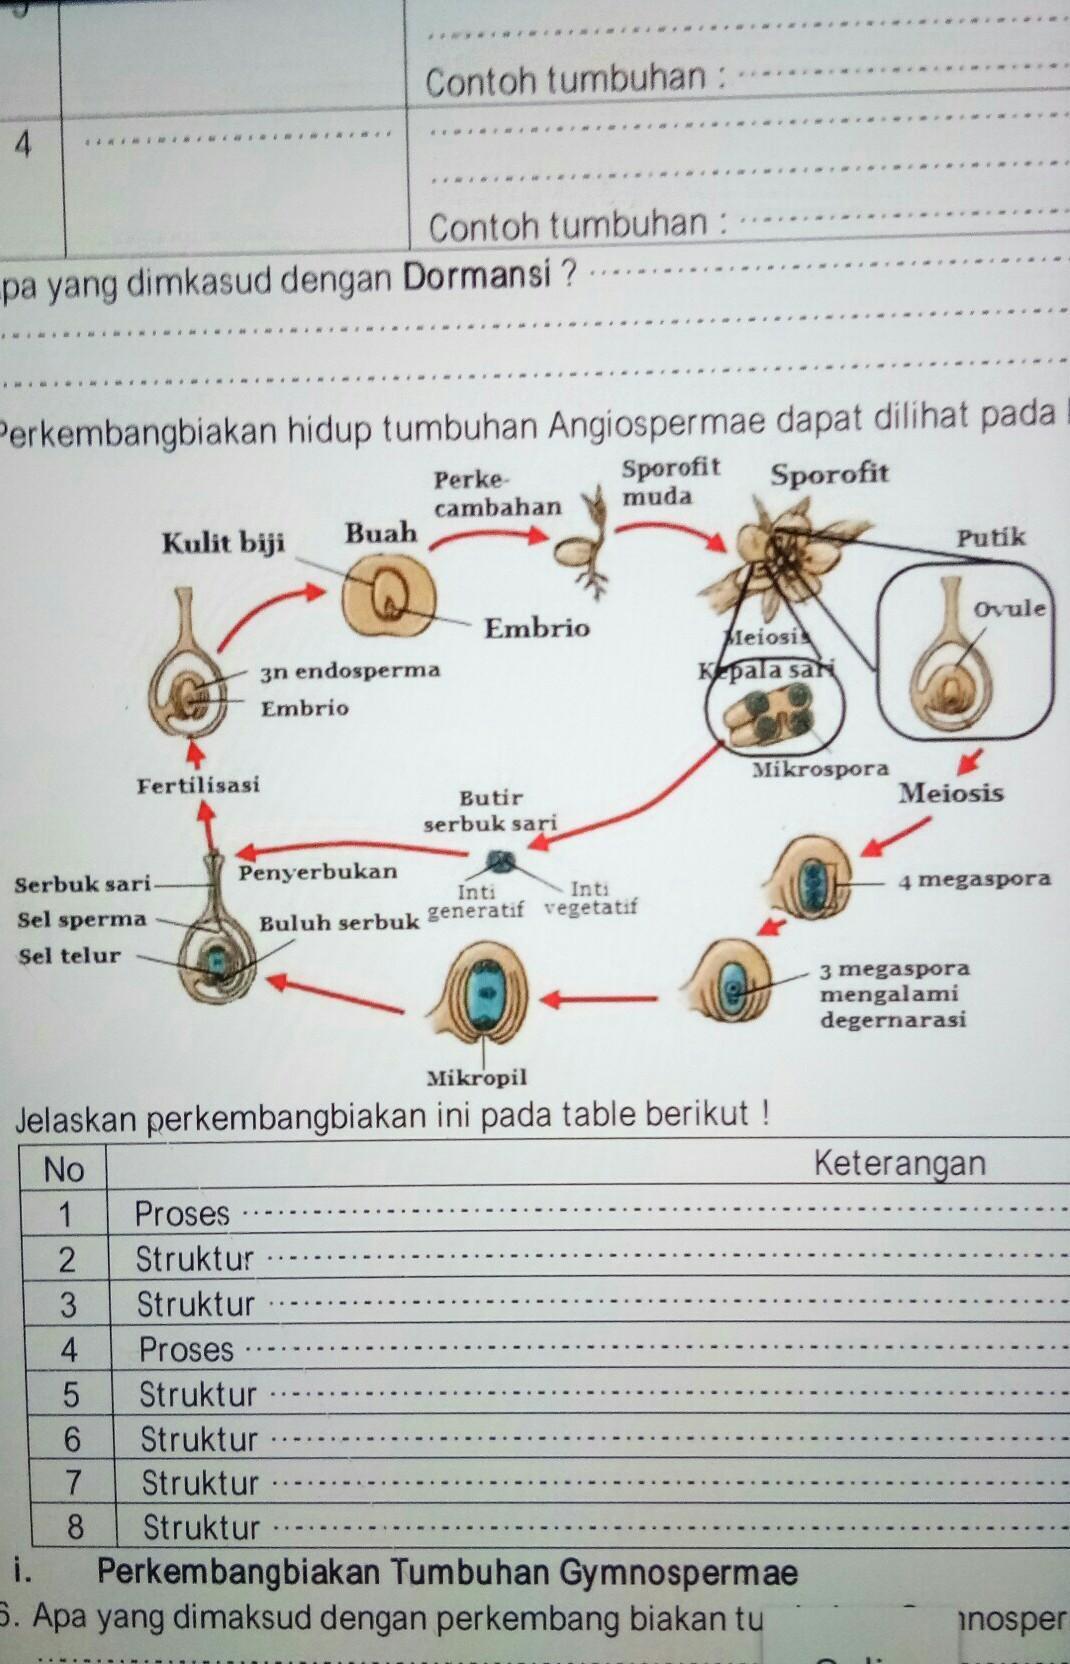 Angiospermae Adalah : angiospermae, adalah, Jelaskan, Pembuahan, Perkembangbiakan, Hidup, Tumbuhan, Angiospermae, Dimaksud, Dengan, Brainly.co.id